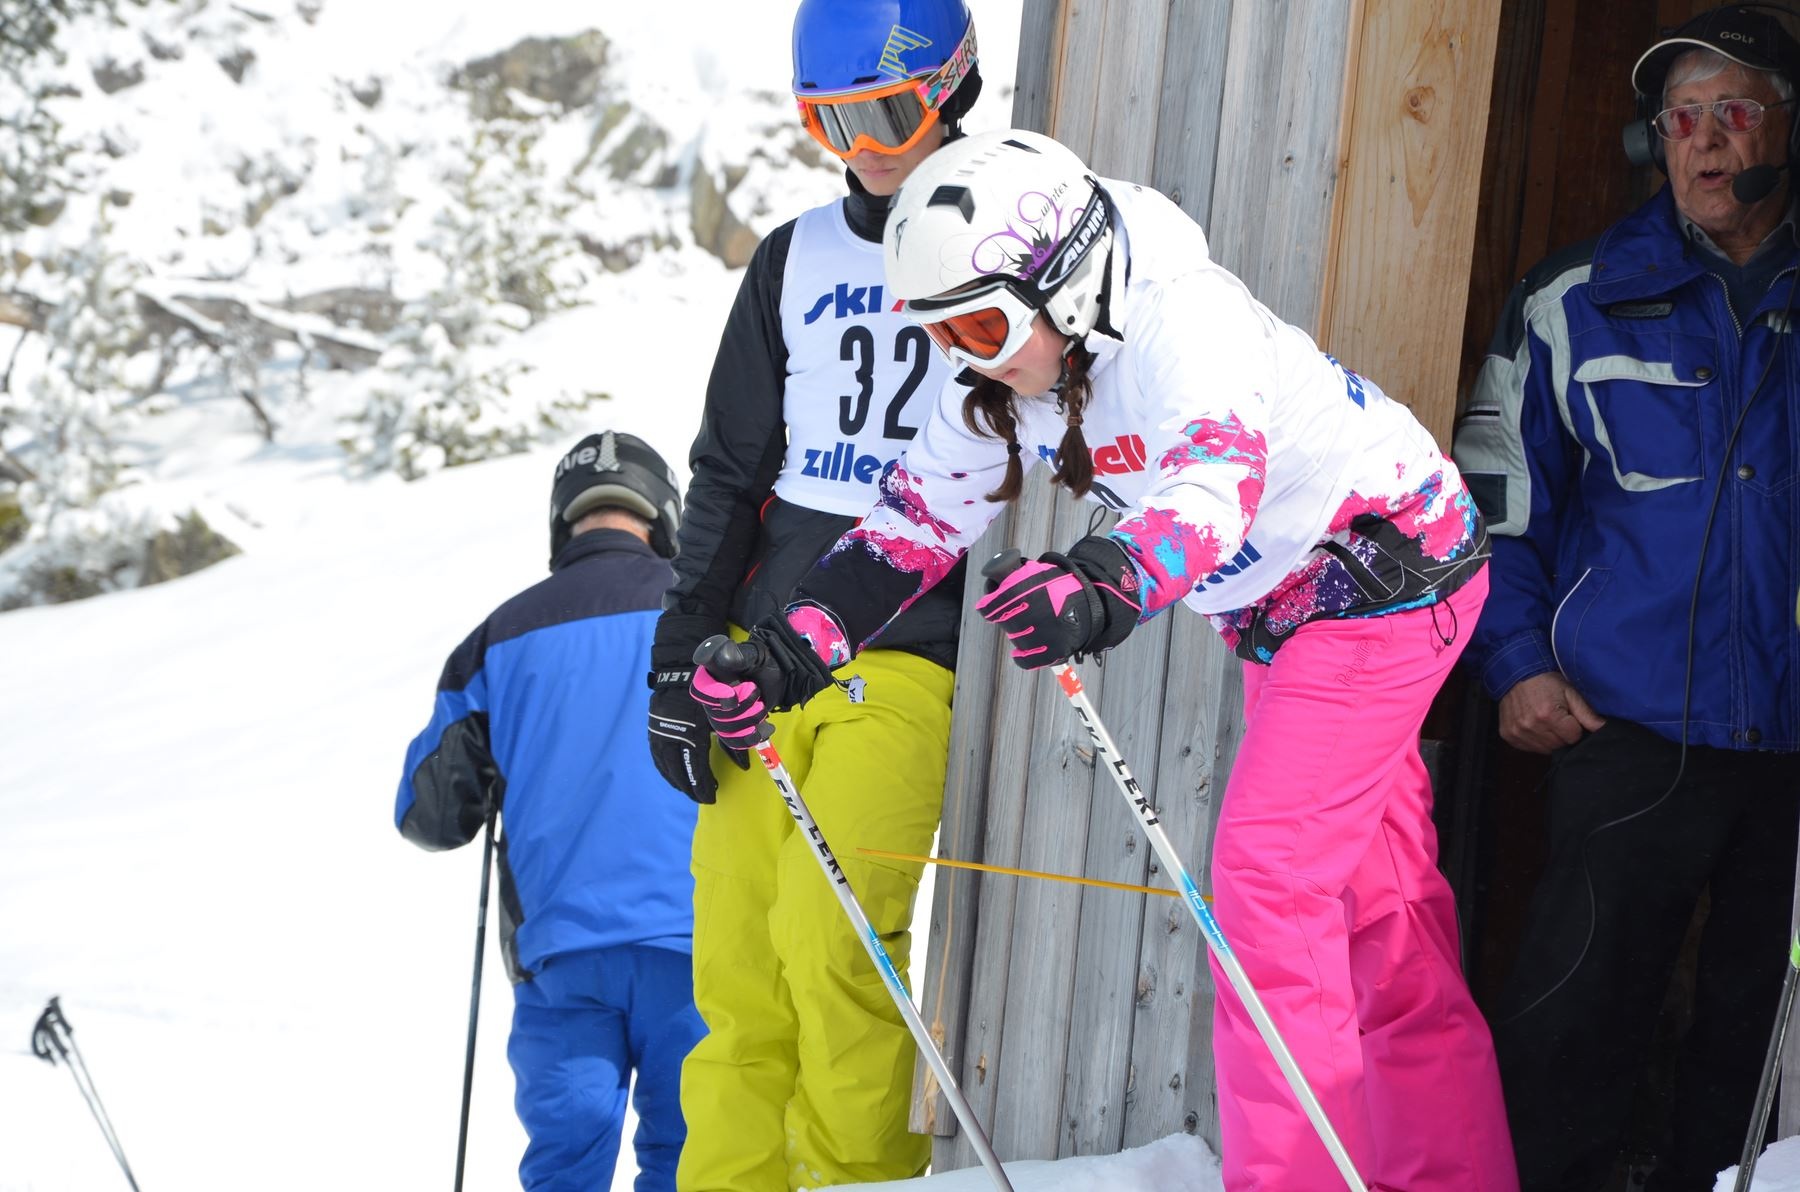 2015-03-22 BV Zillertal Skirennen 096.JPG